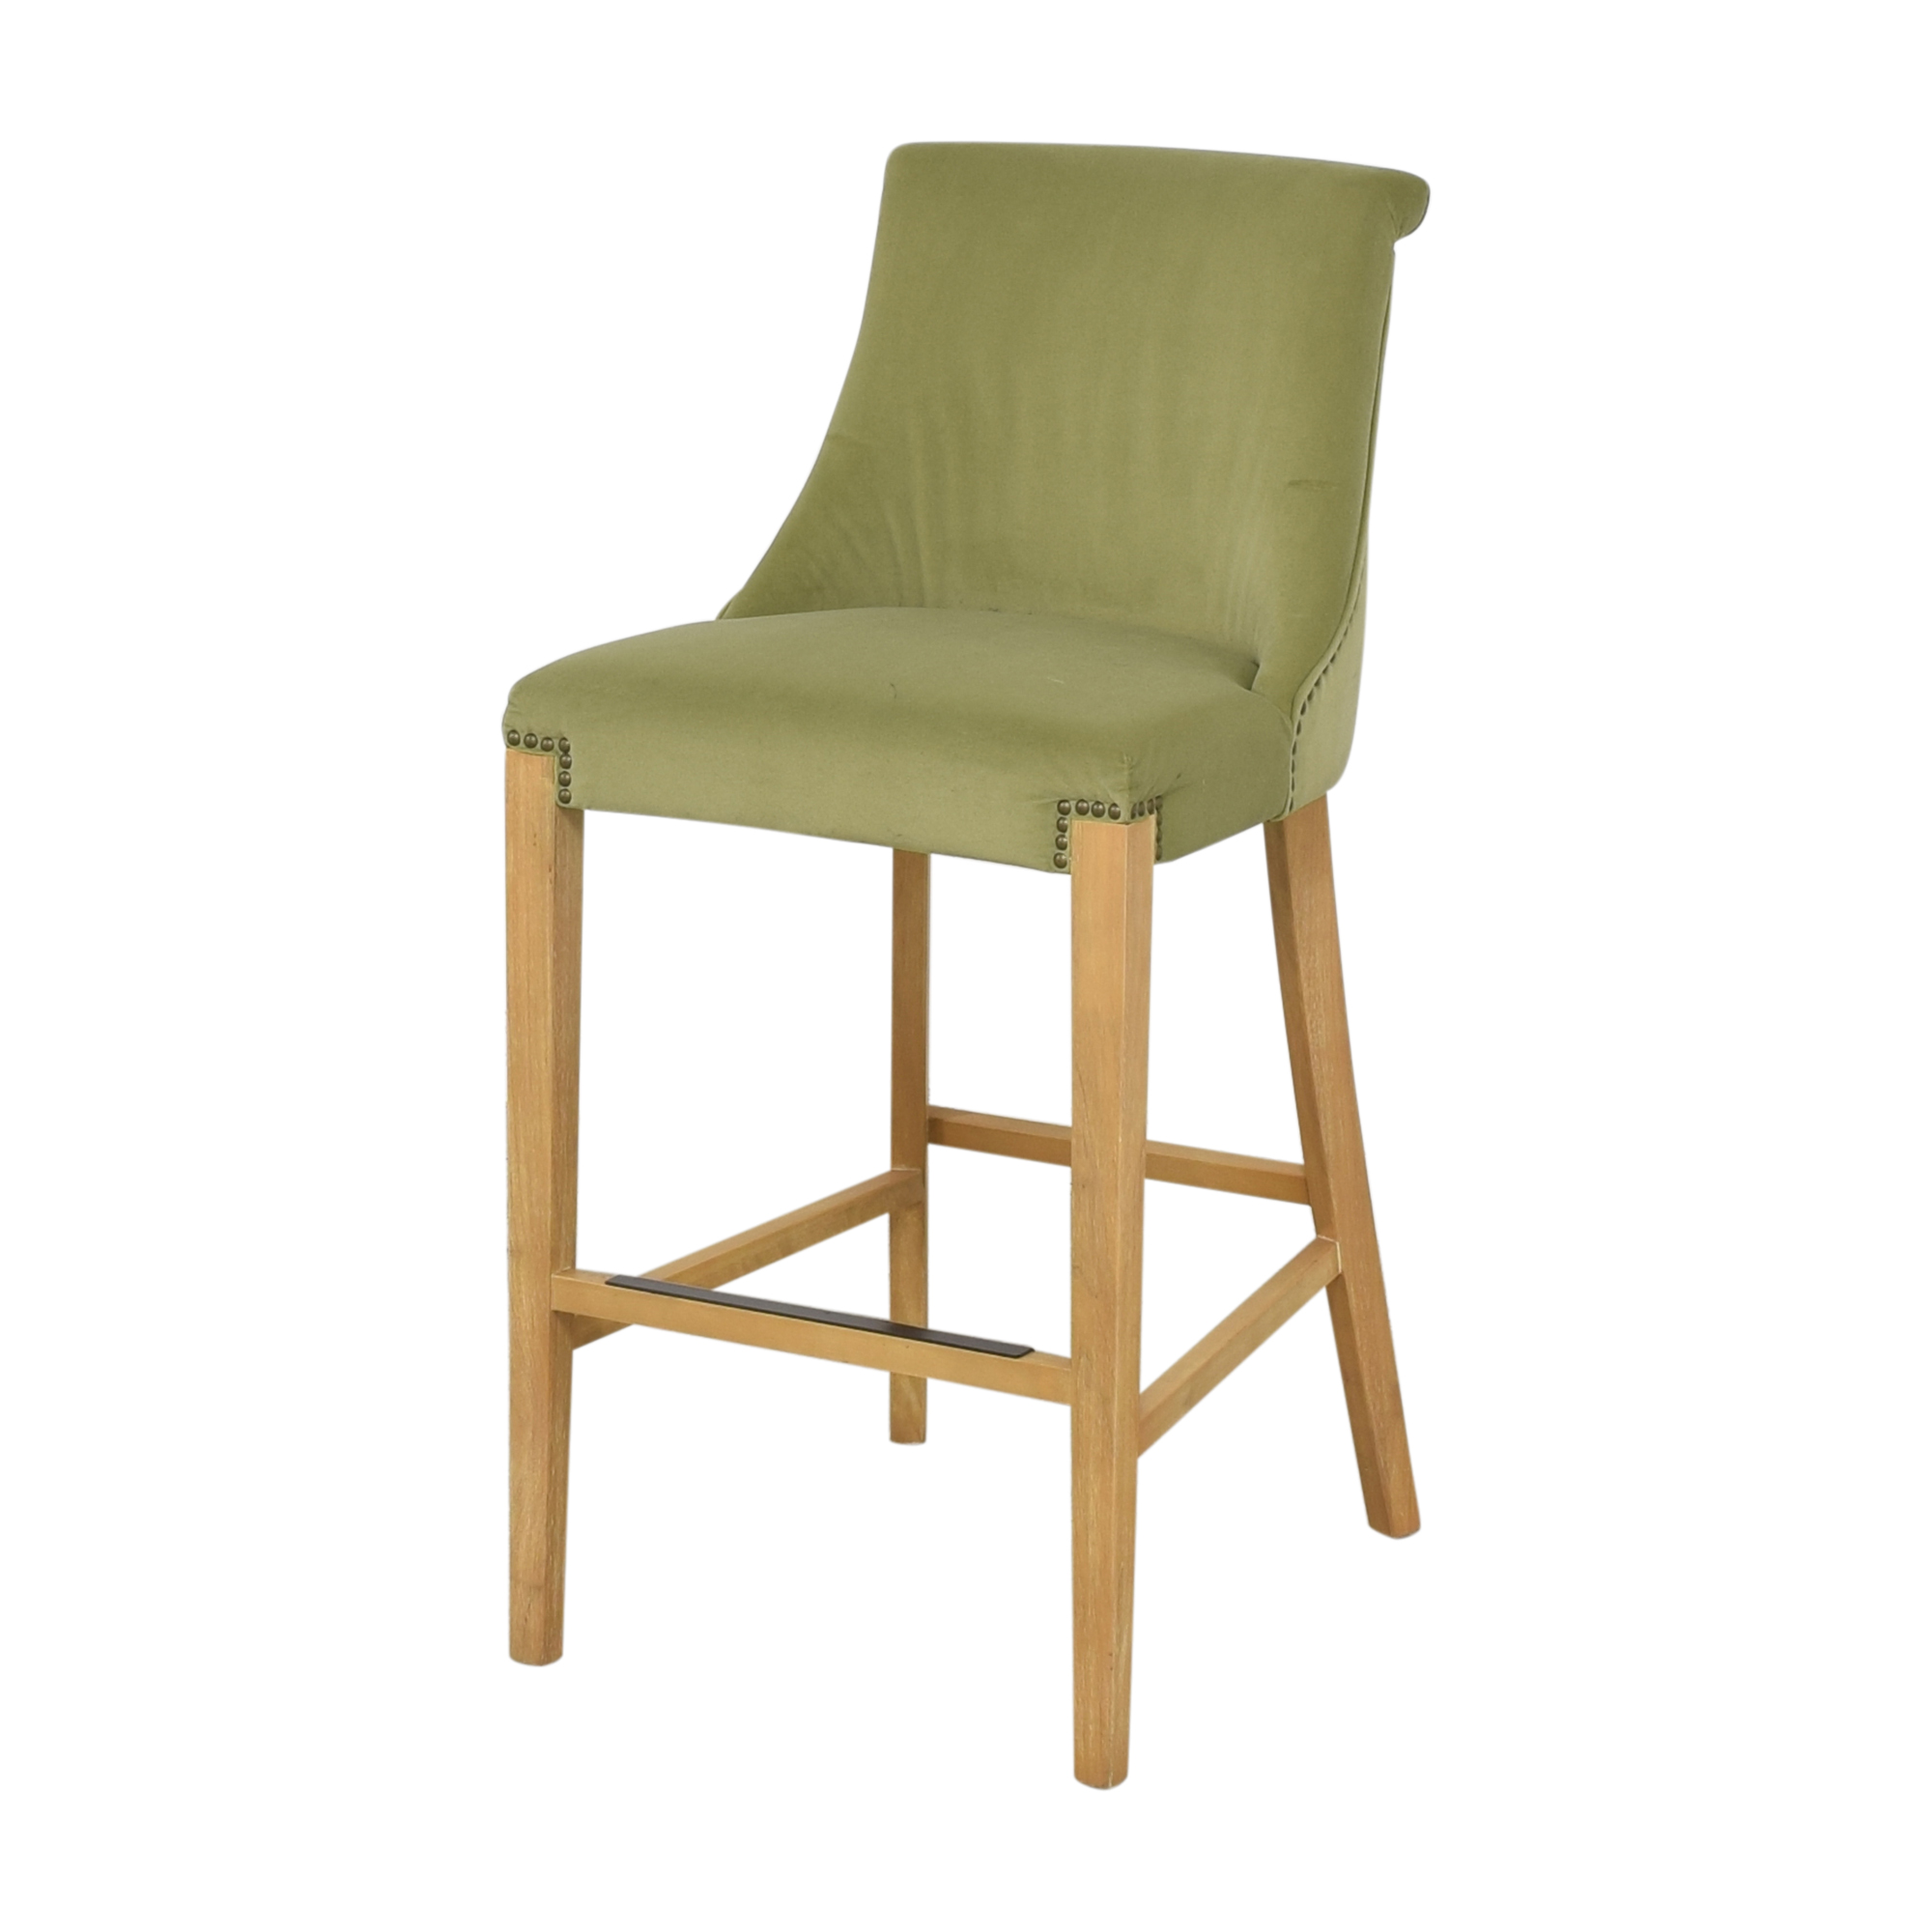 Jason Furniture Nailhead Trim Bar Stools / Stools